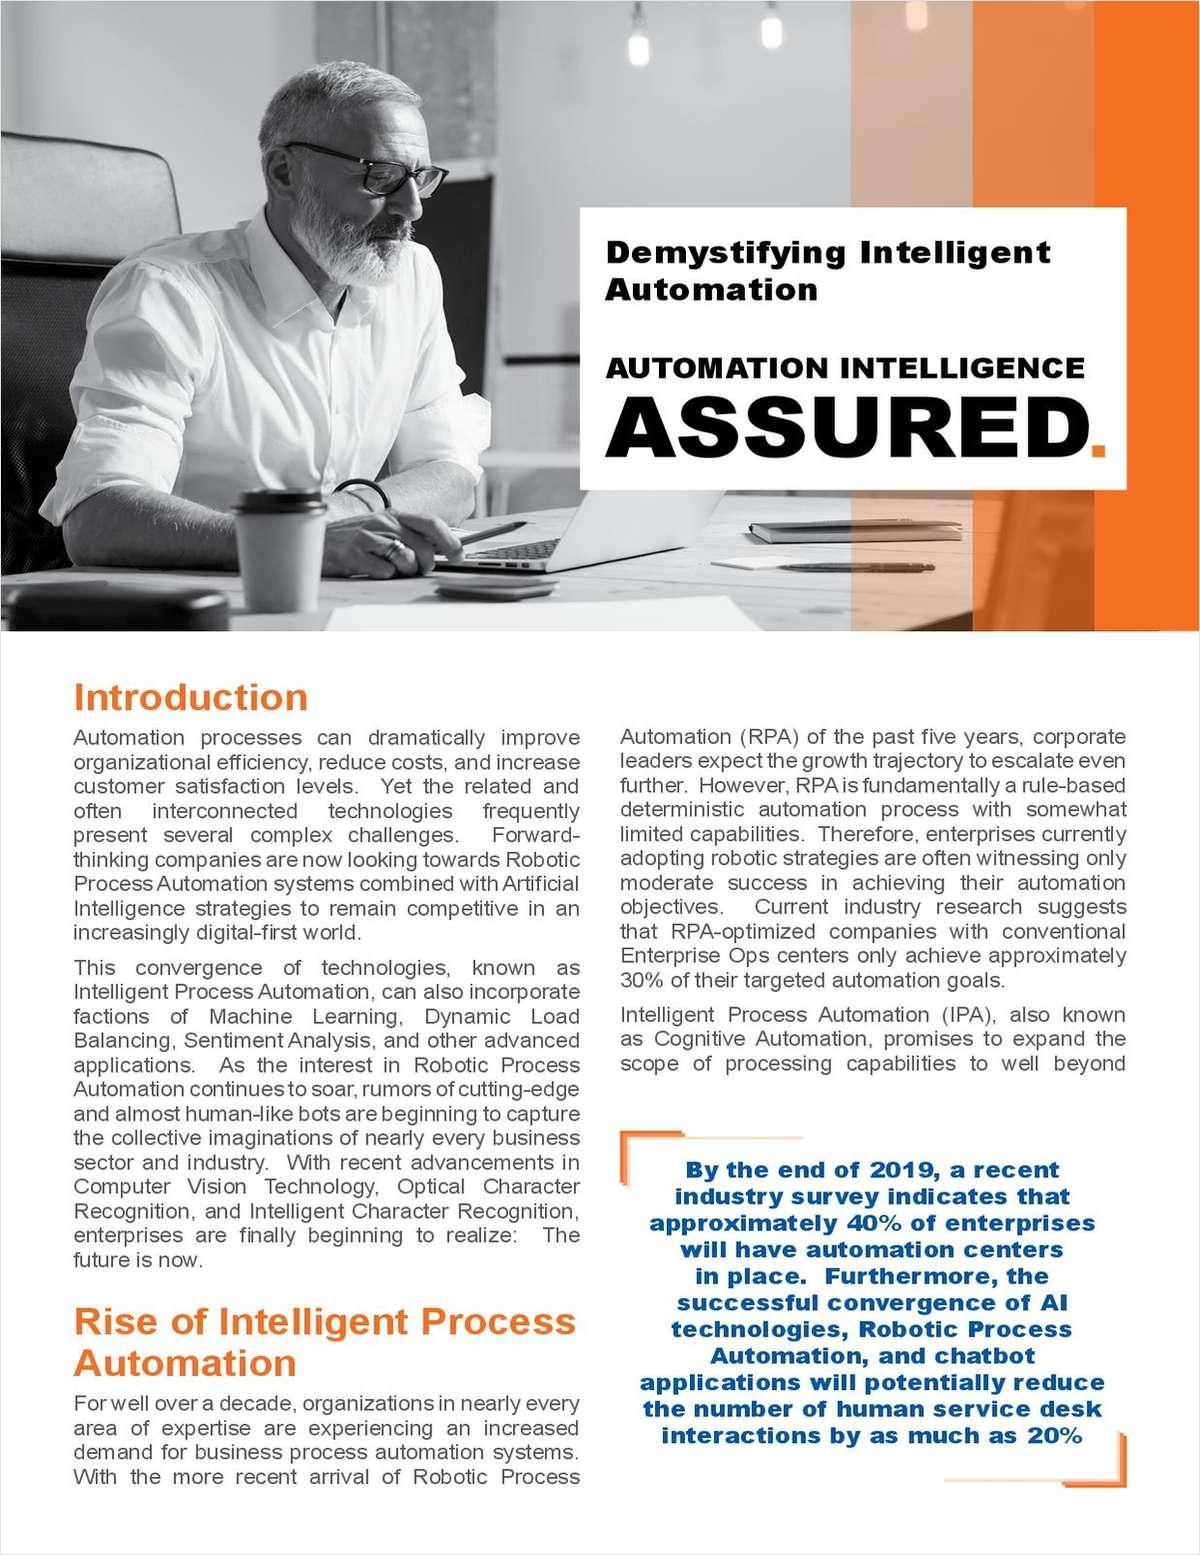 Demystifying Intelligent Automation